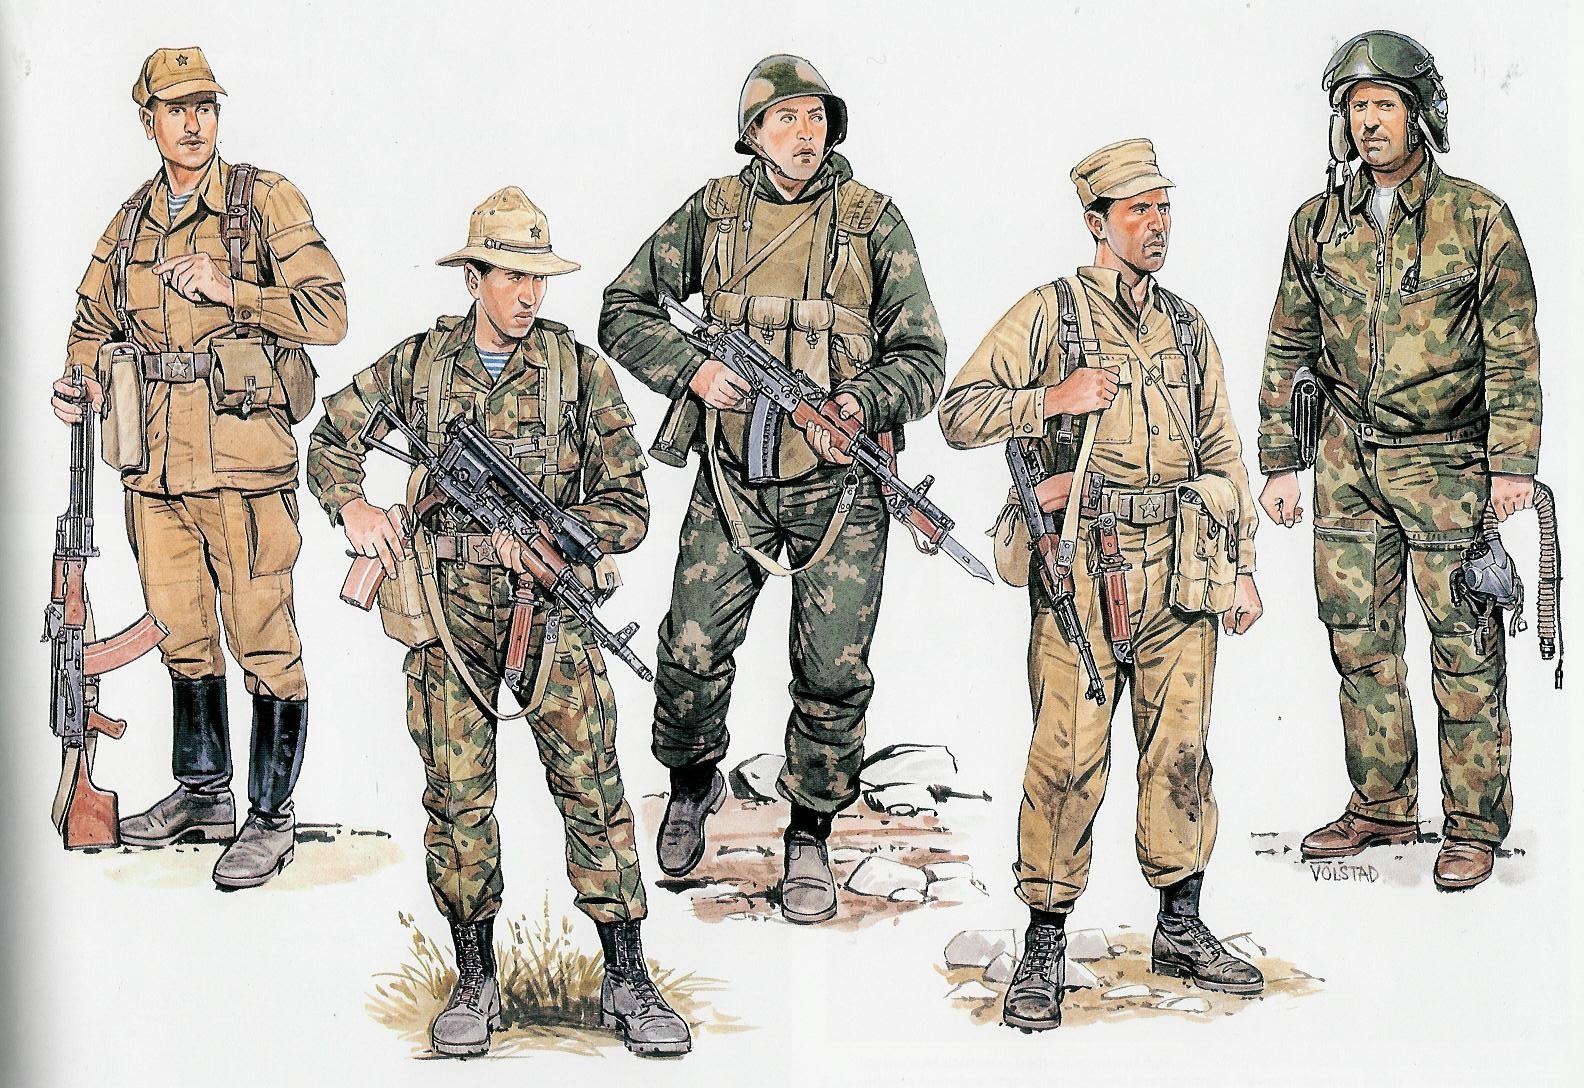 General 1584x1088 Soviet Union USSR Afghanistan soldier artwork military